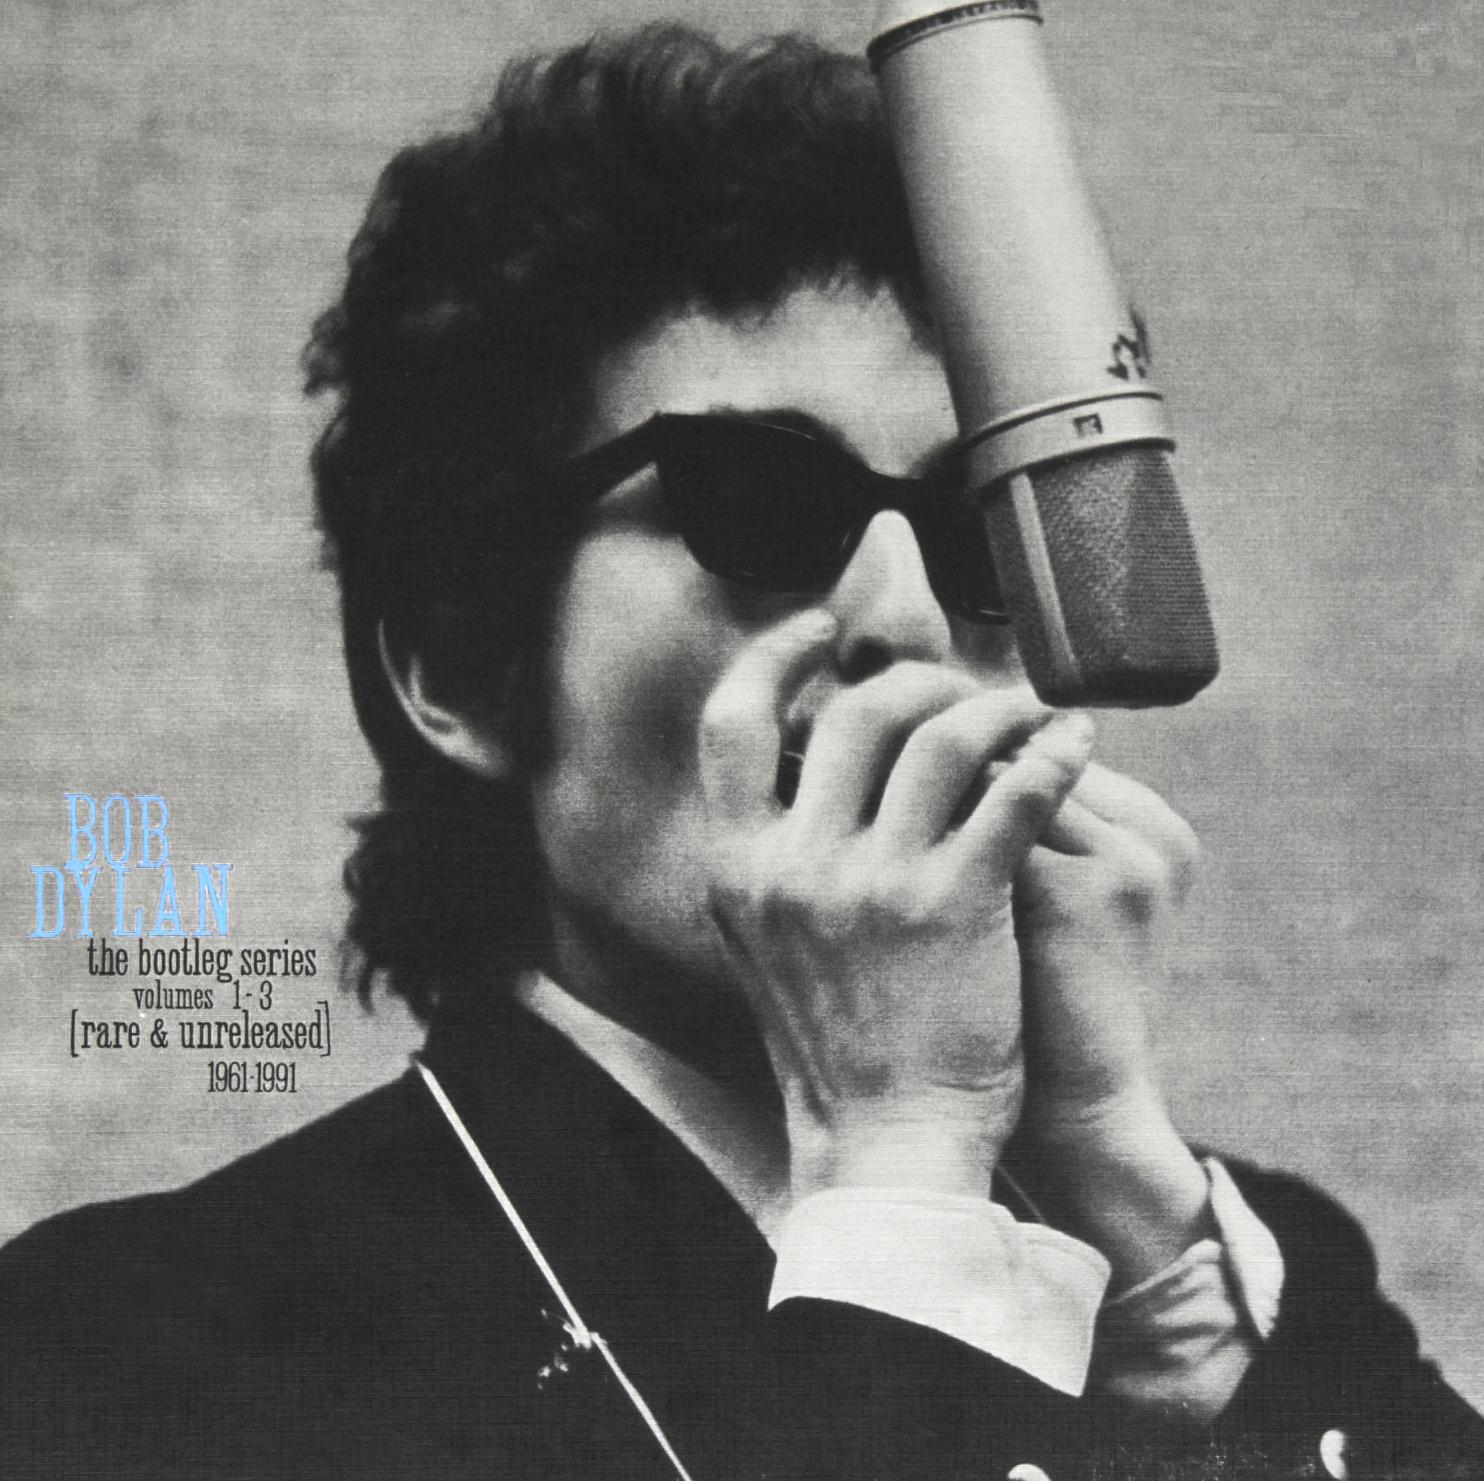 Bob Dylan (ボブ・ディラン)『the bootleg series, volumes 1-3 [rare and unreleased] 1961-1991』高画質ジャケット画像